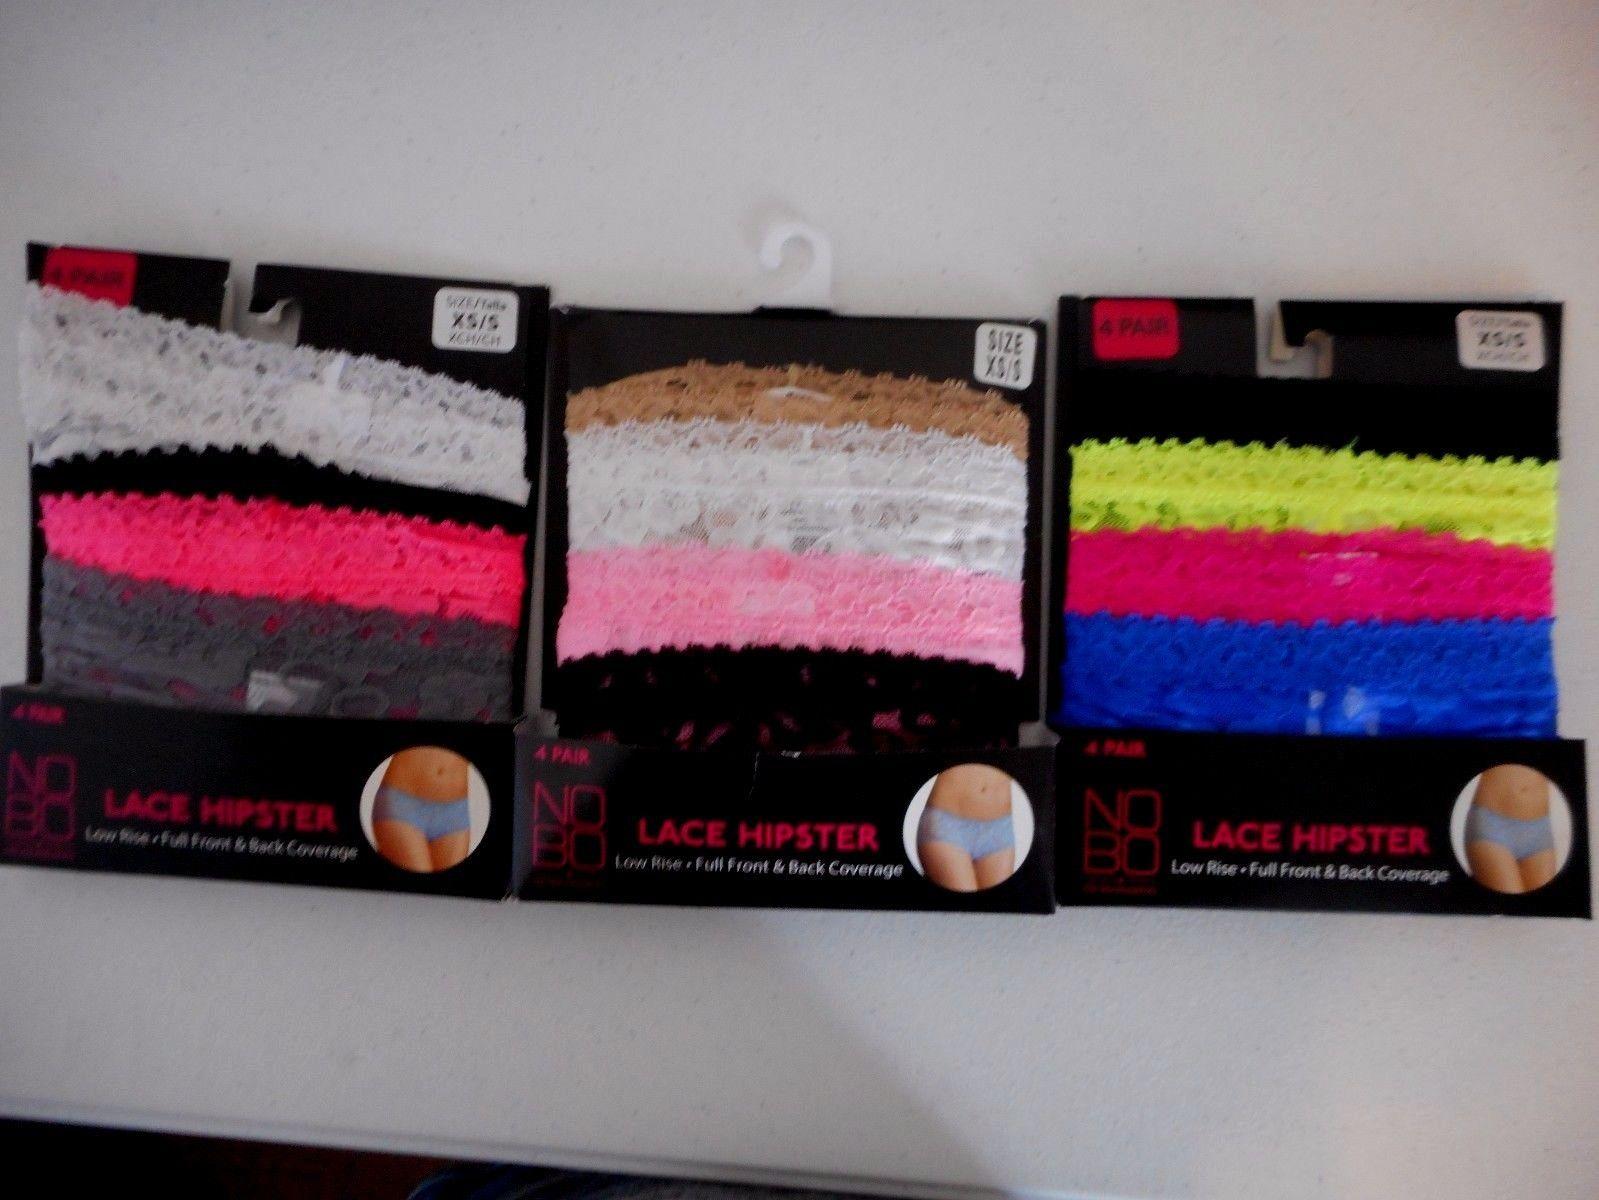 4dfc43e20501 Women's Juniors No Boundaries Lace Hipsters 12 Pack Size XS/S White Black  NEW - $28.70